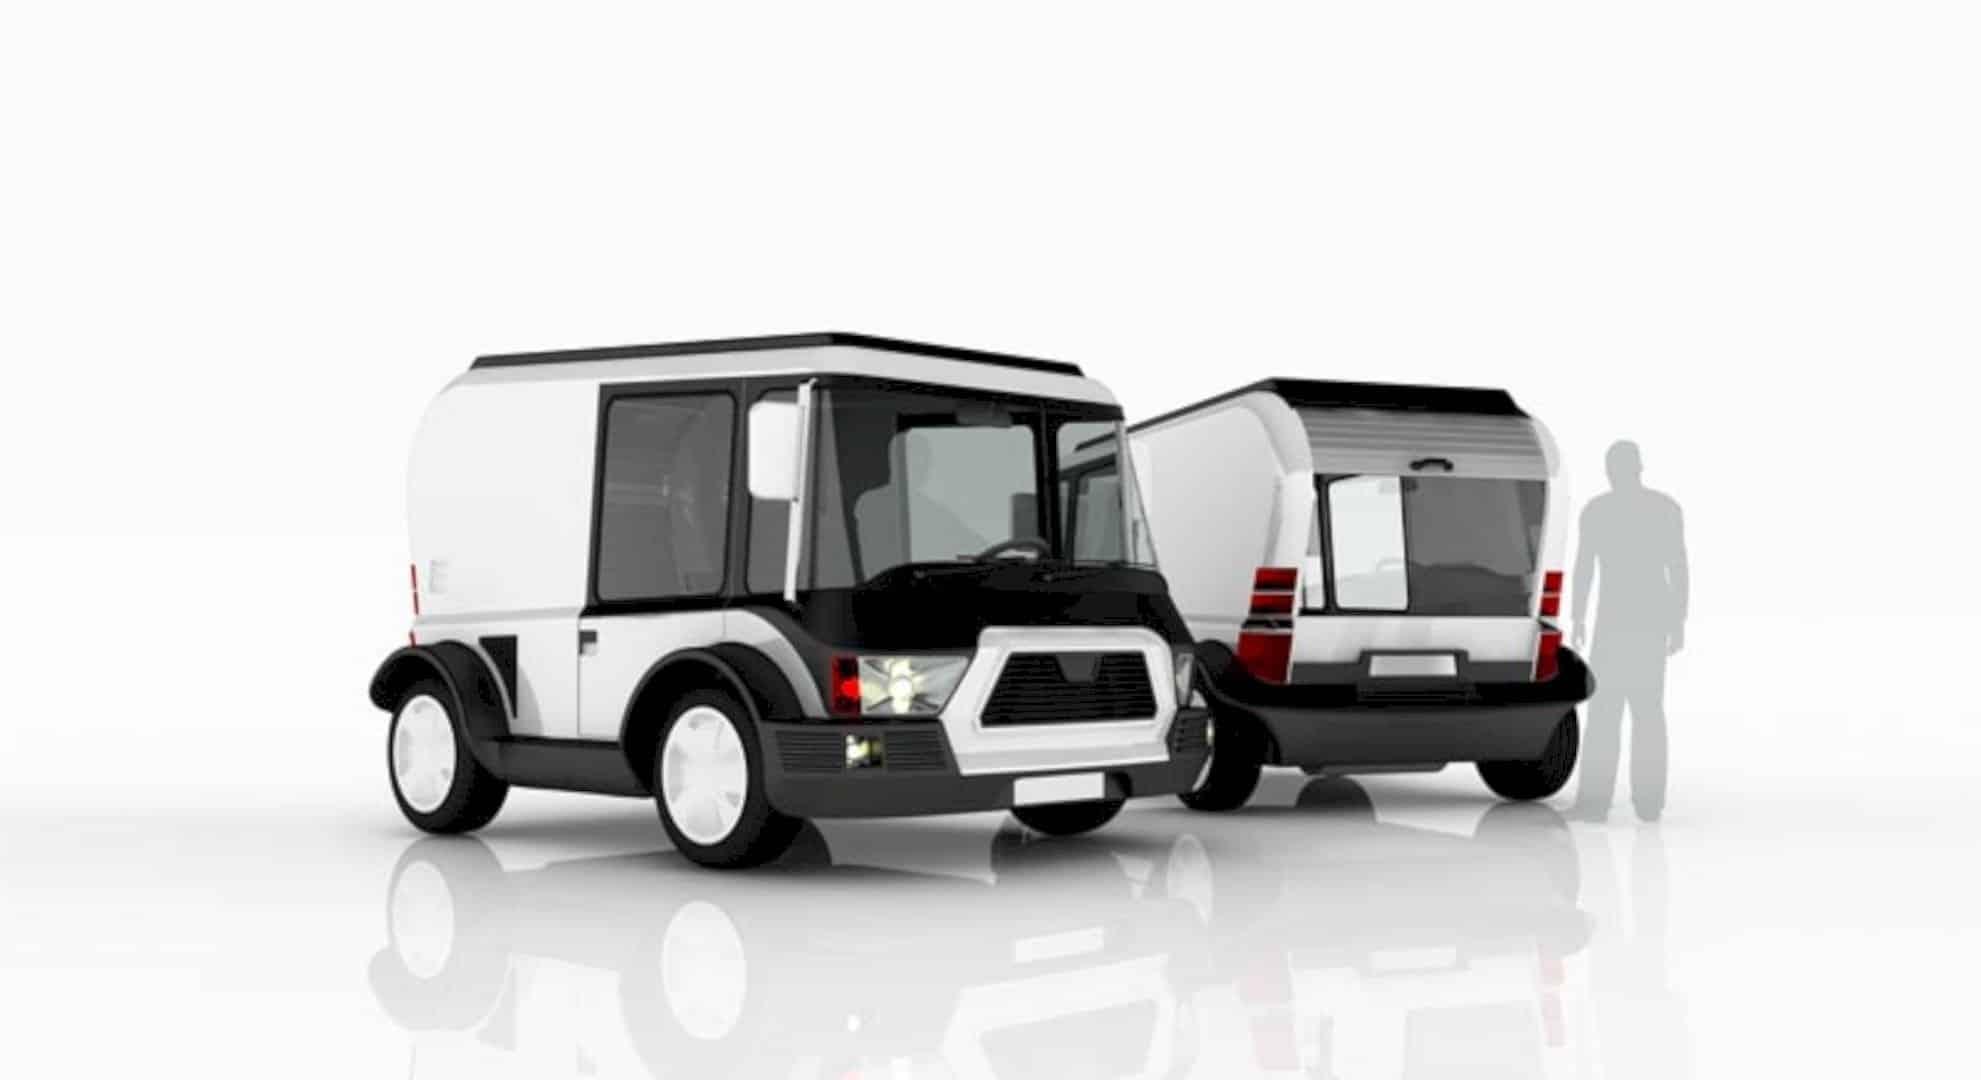 Solar Taxi 2